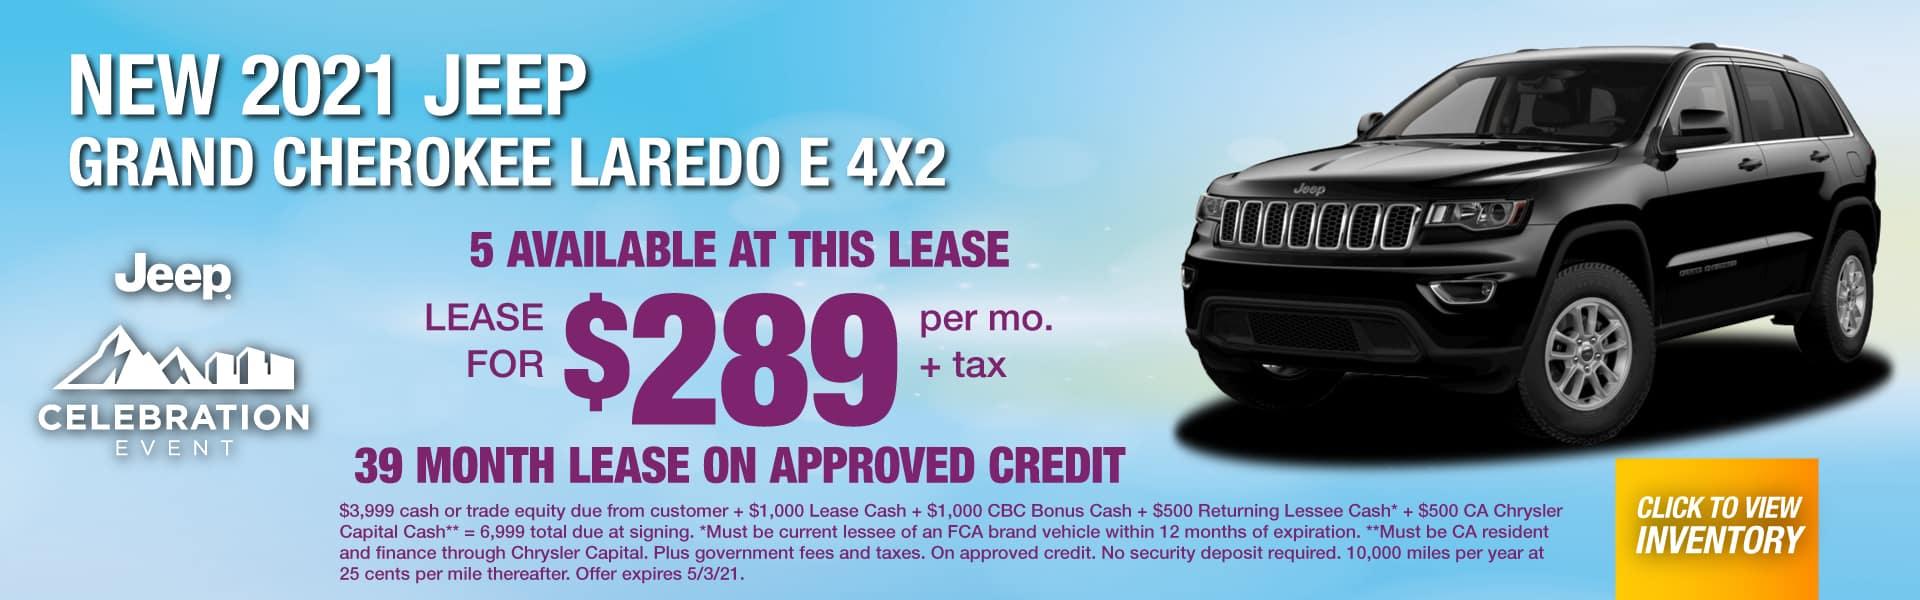 SD CDJR 1920px_Offers_May3_GC Laredo E